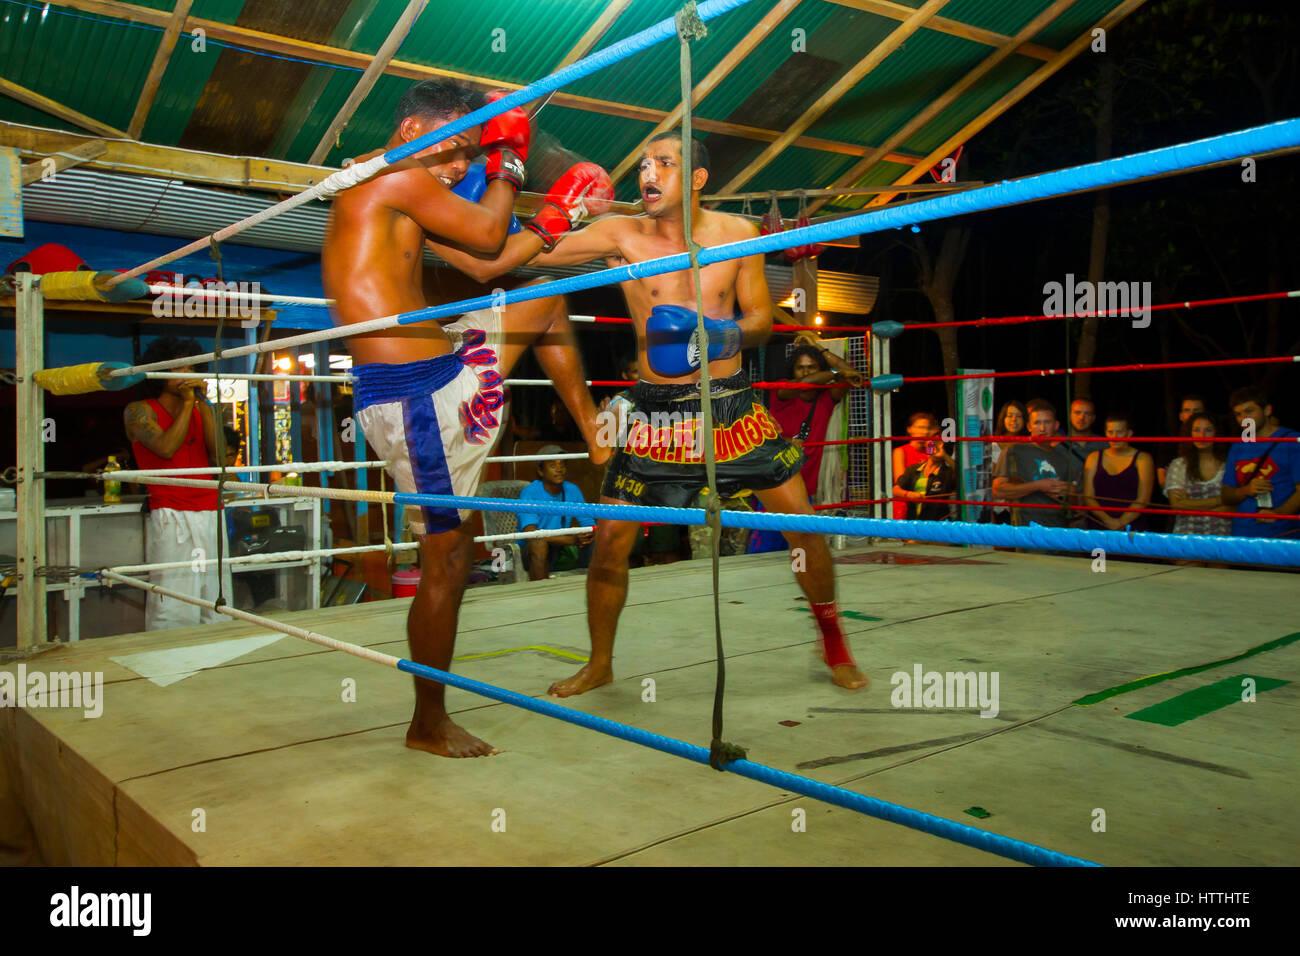 Muay Thai fight. - Stock Image